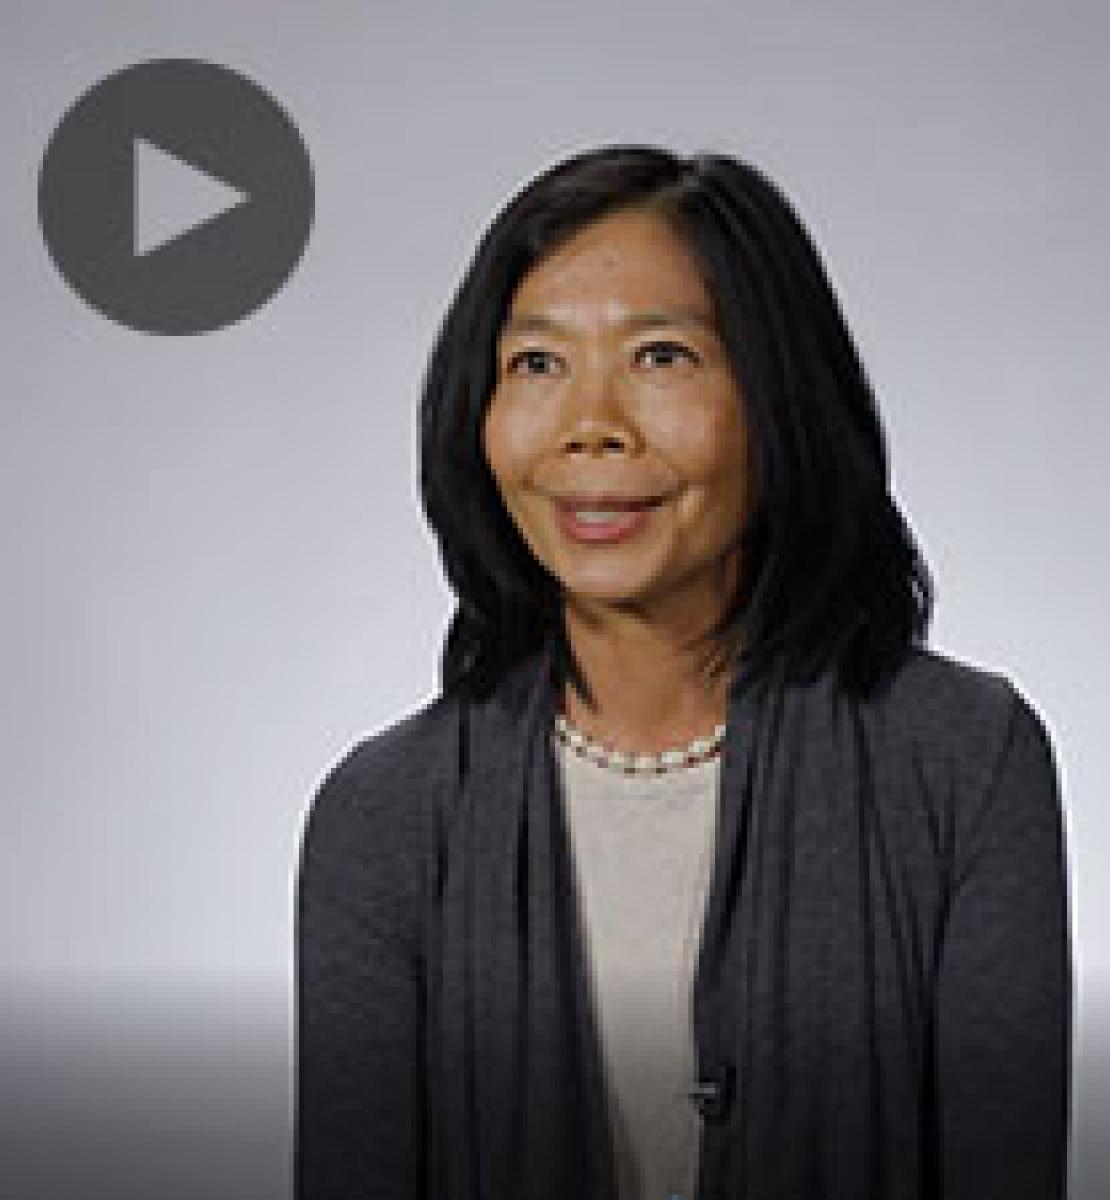 Screenshot from video message shows Resident Coordinator, Pauline Tamesis